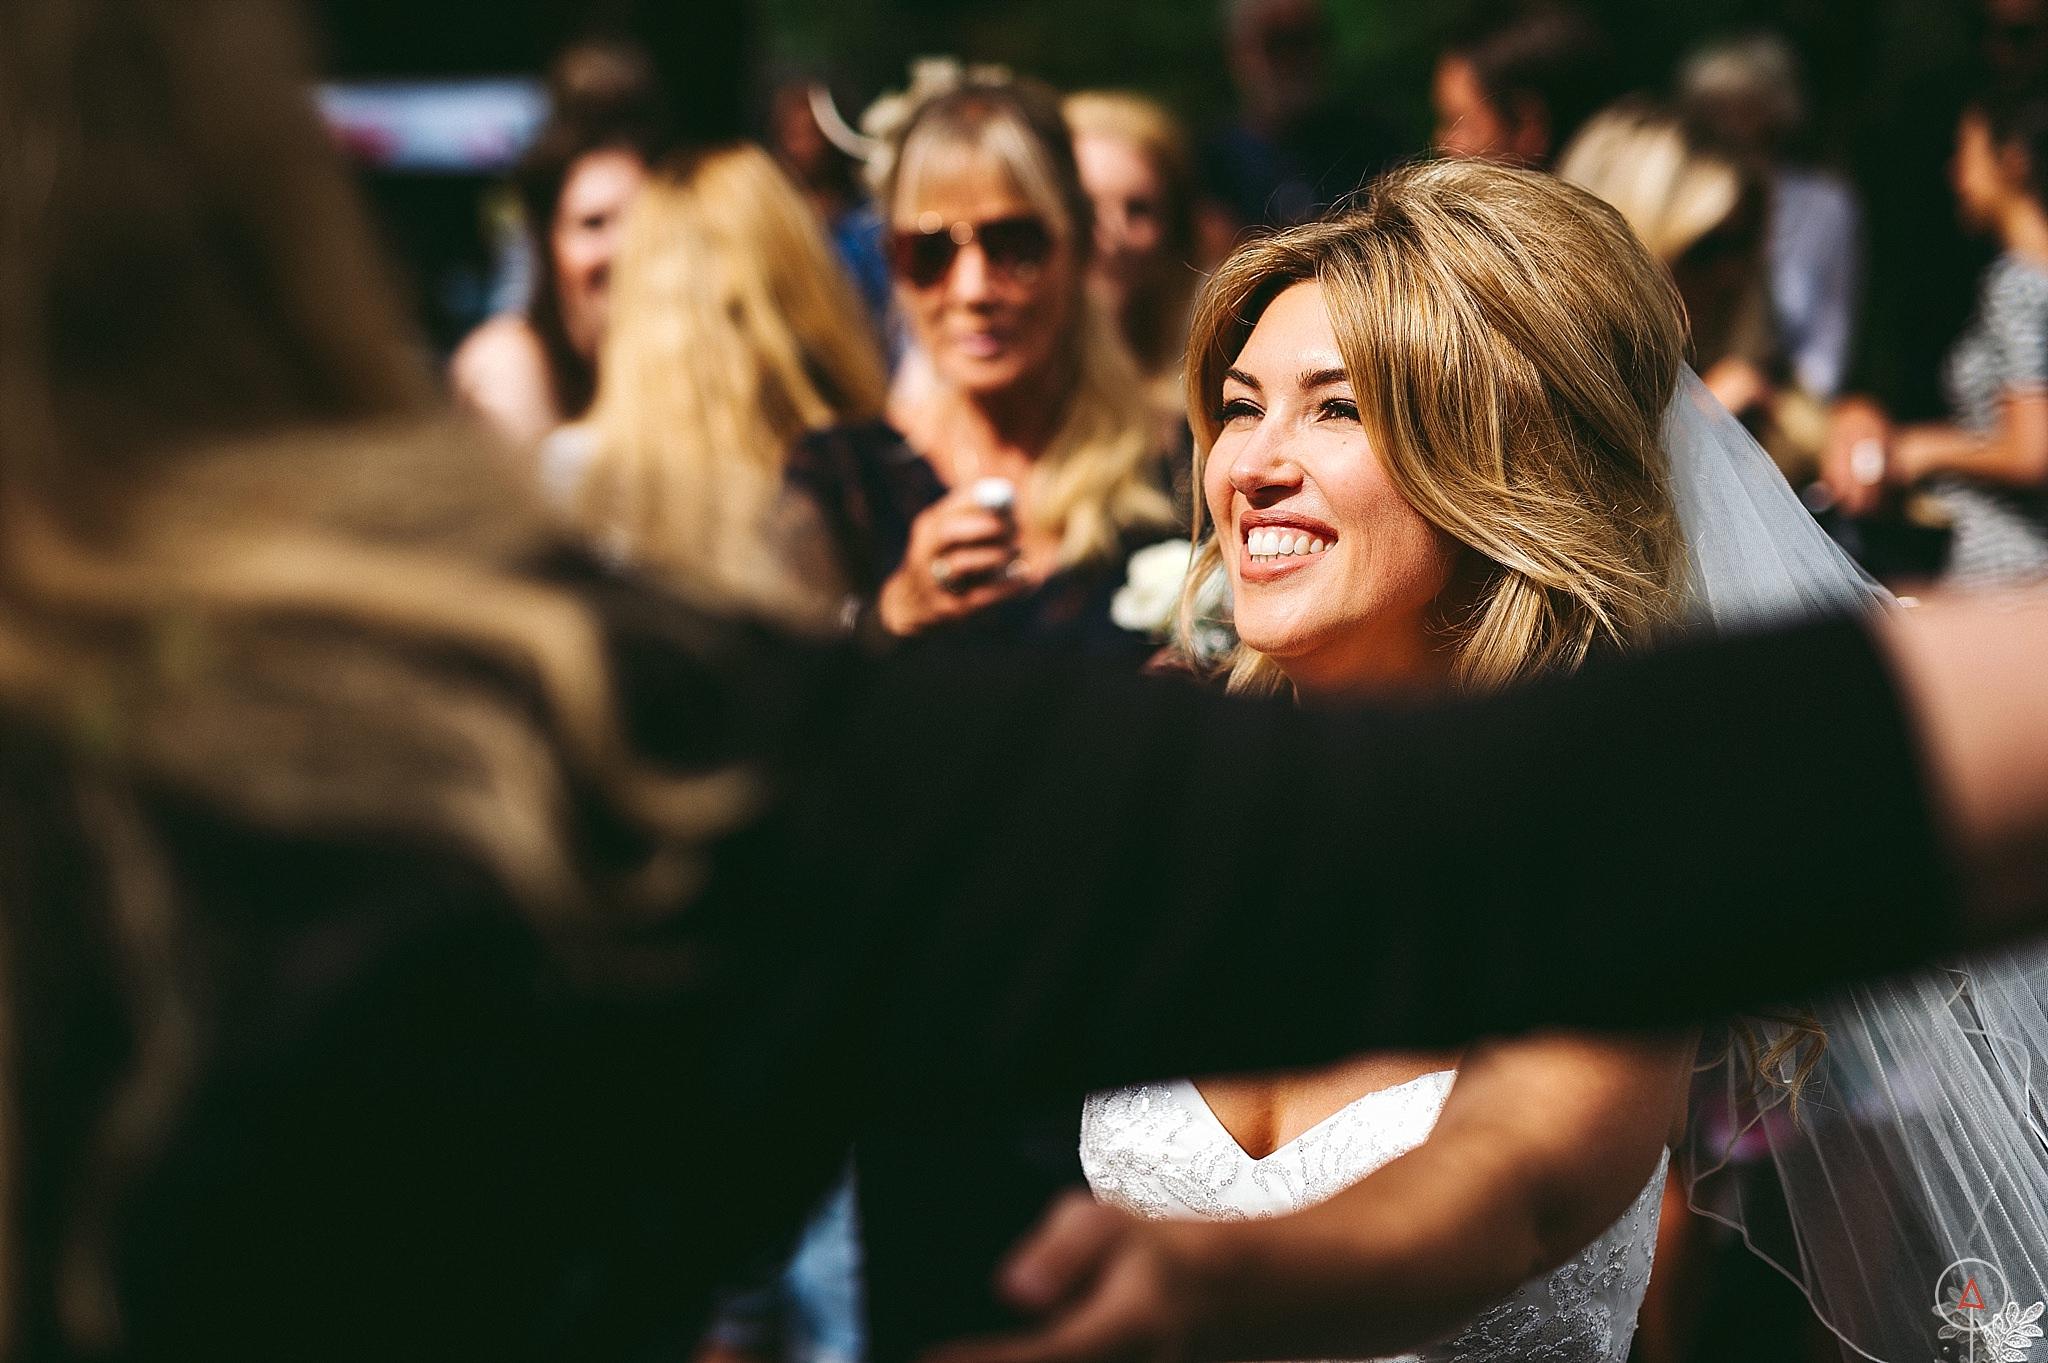 cardiff-wedding-photographer-aga-tomaszek_0374